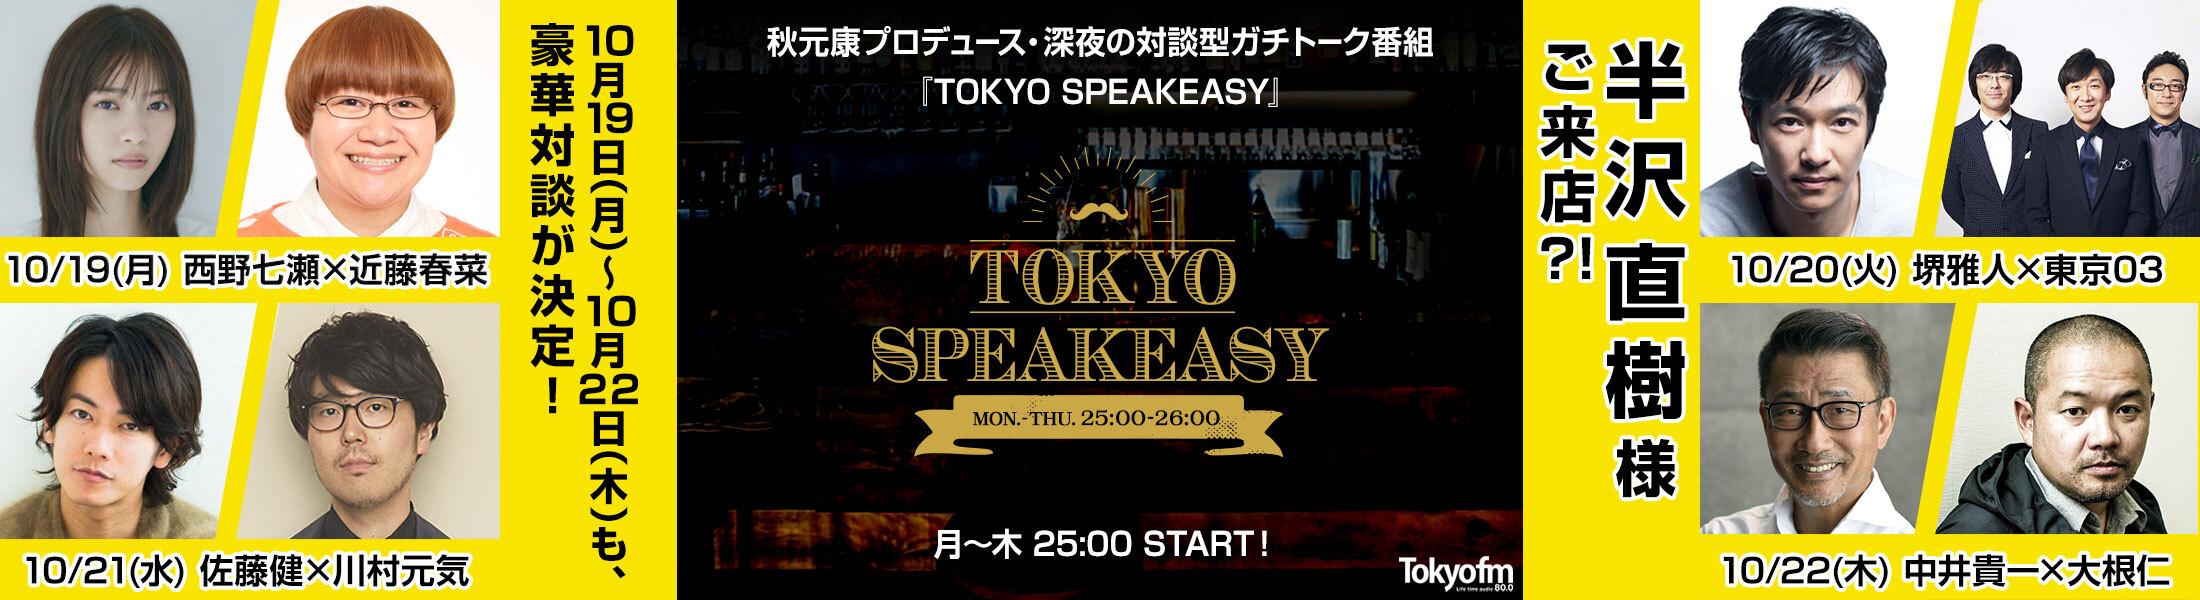 TOKYO SPEAKEASY